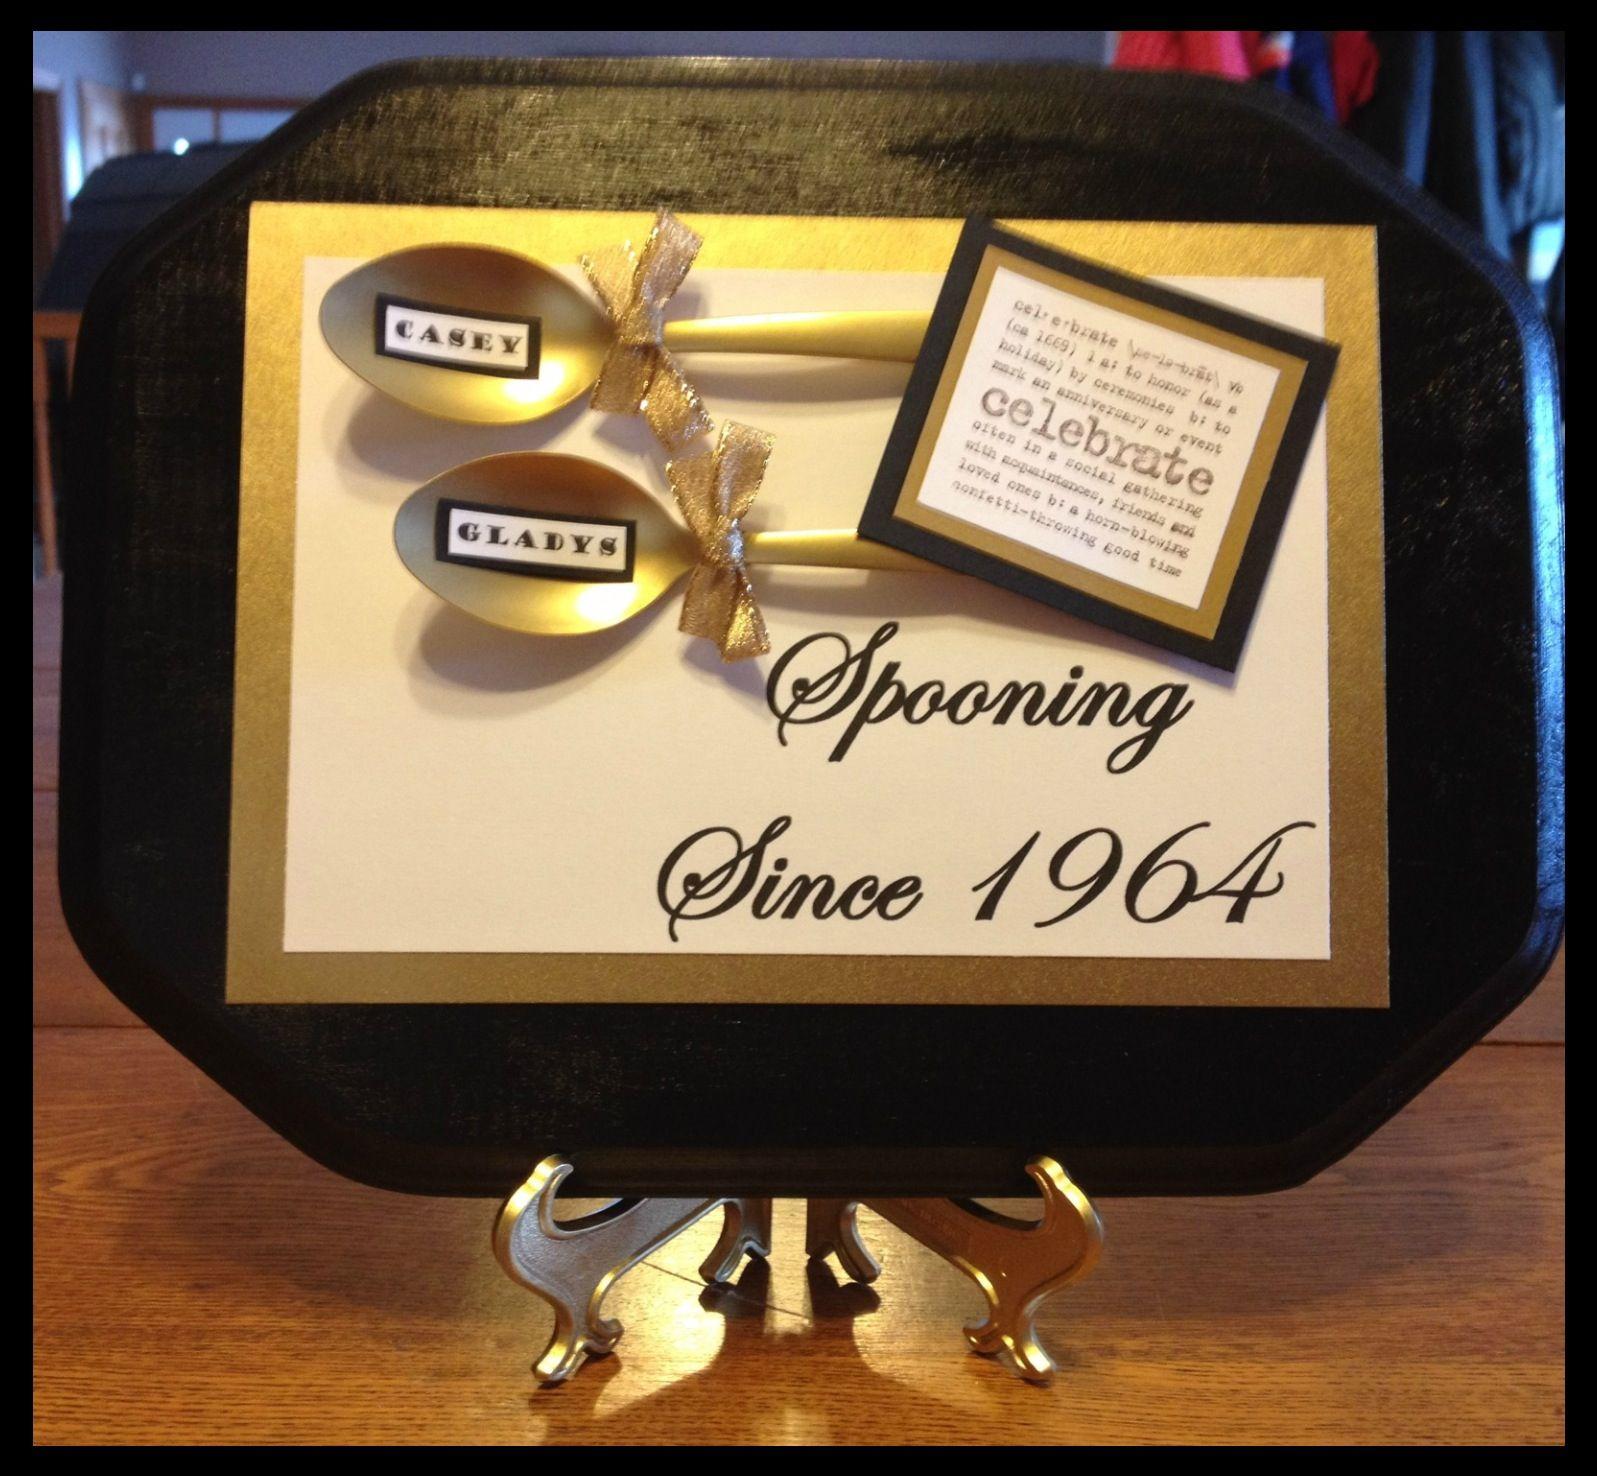 Golden Wedding Anniversary Gift Ideas: 50th Wedding Anniversary Gift